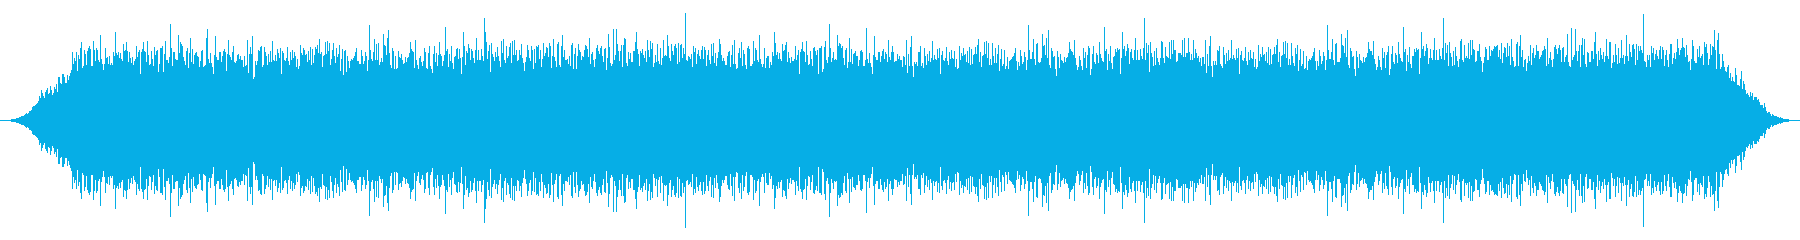 PC 駆動音03-06(ロング)の再生済みの波形